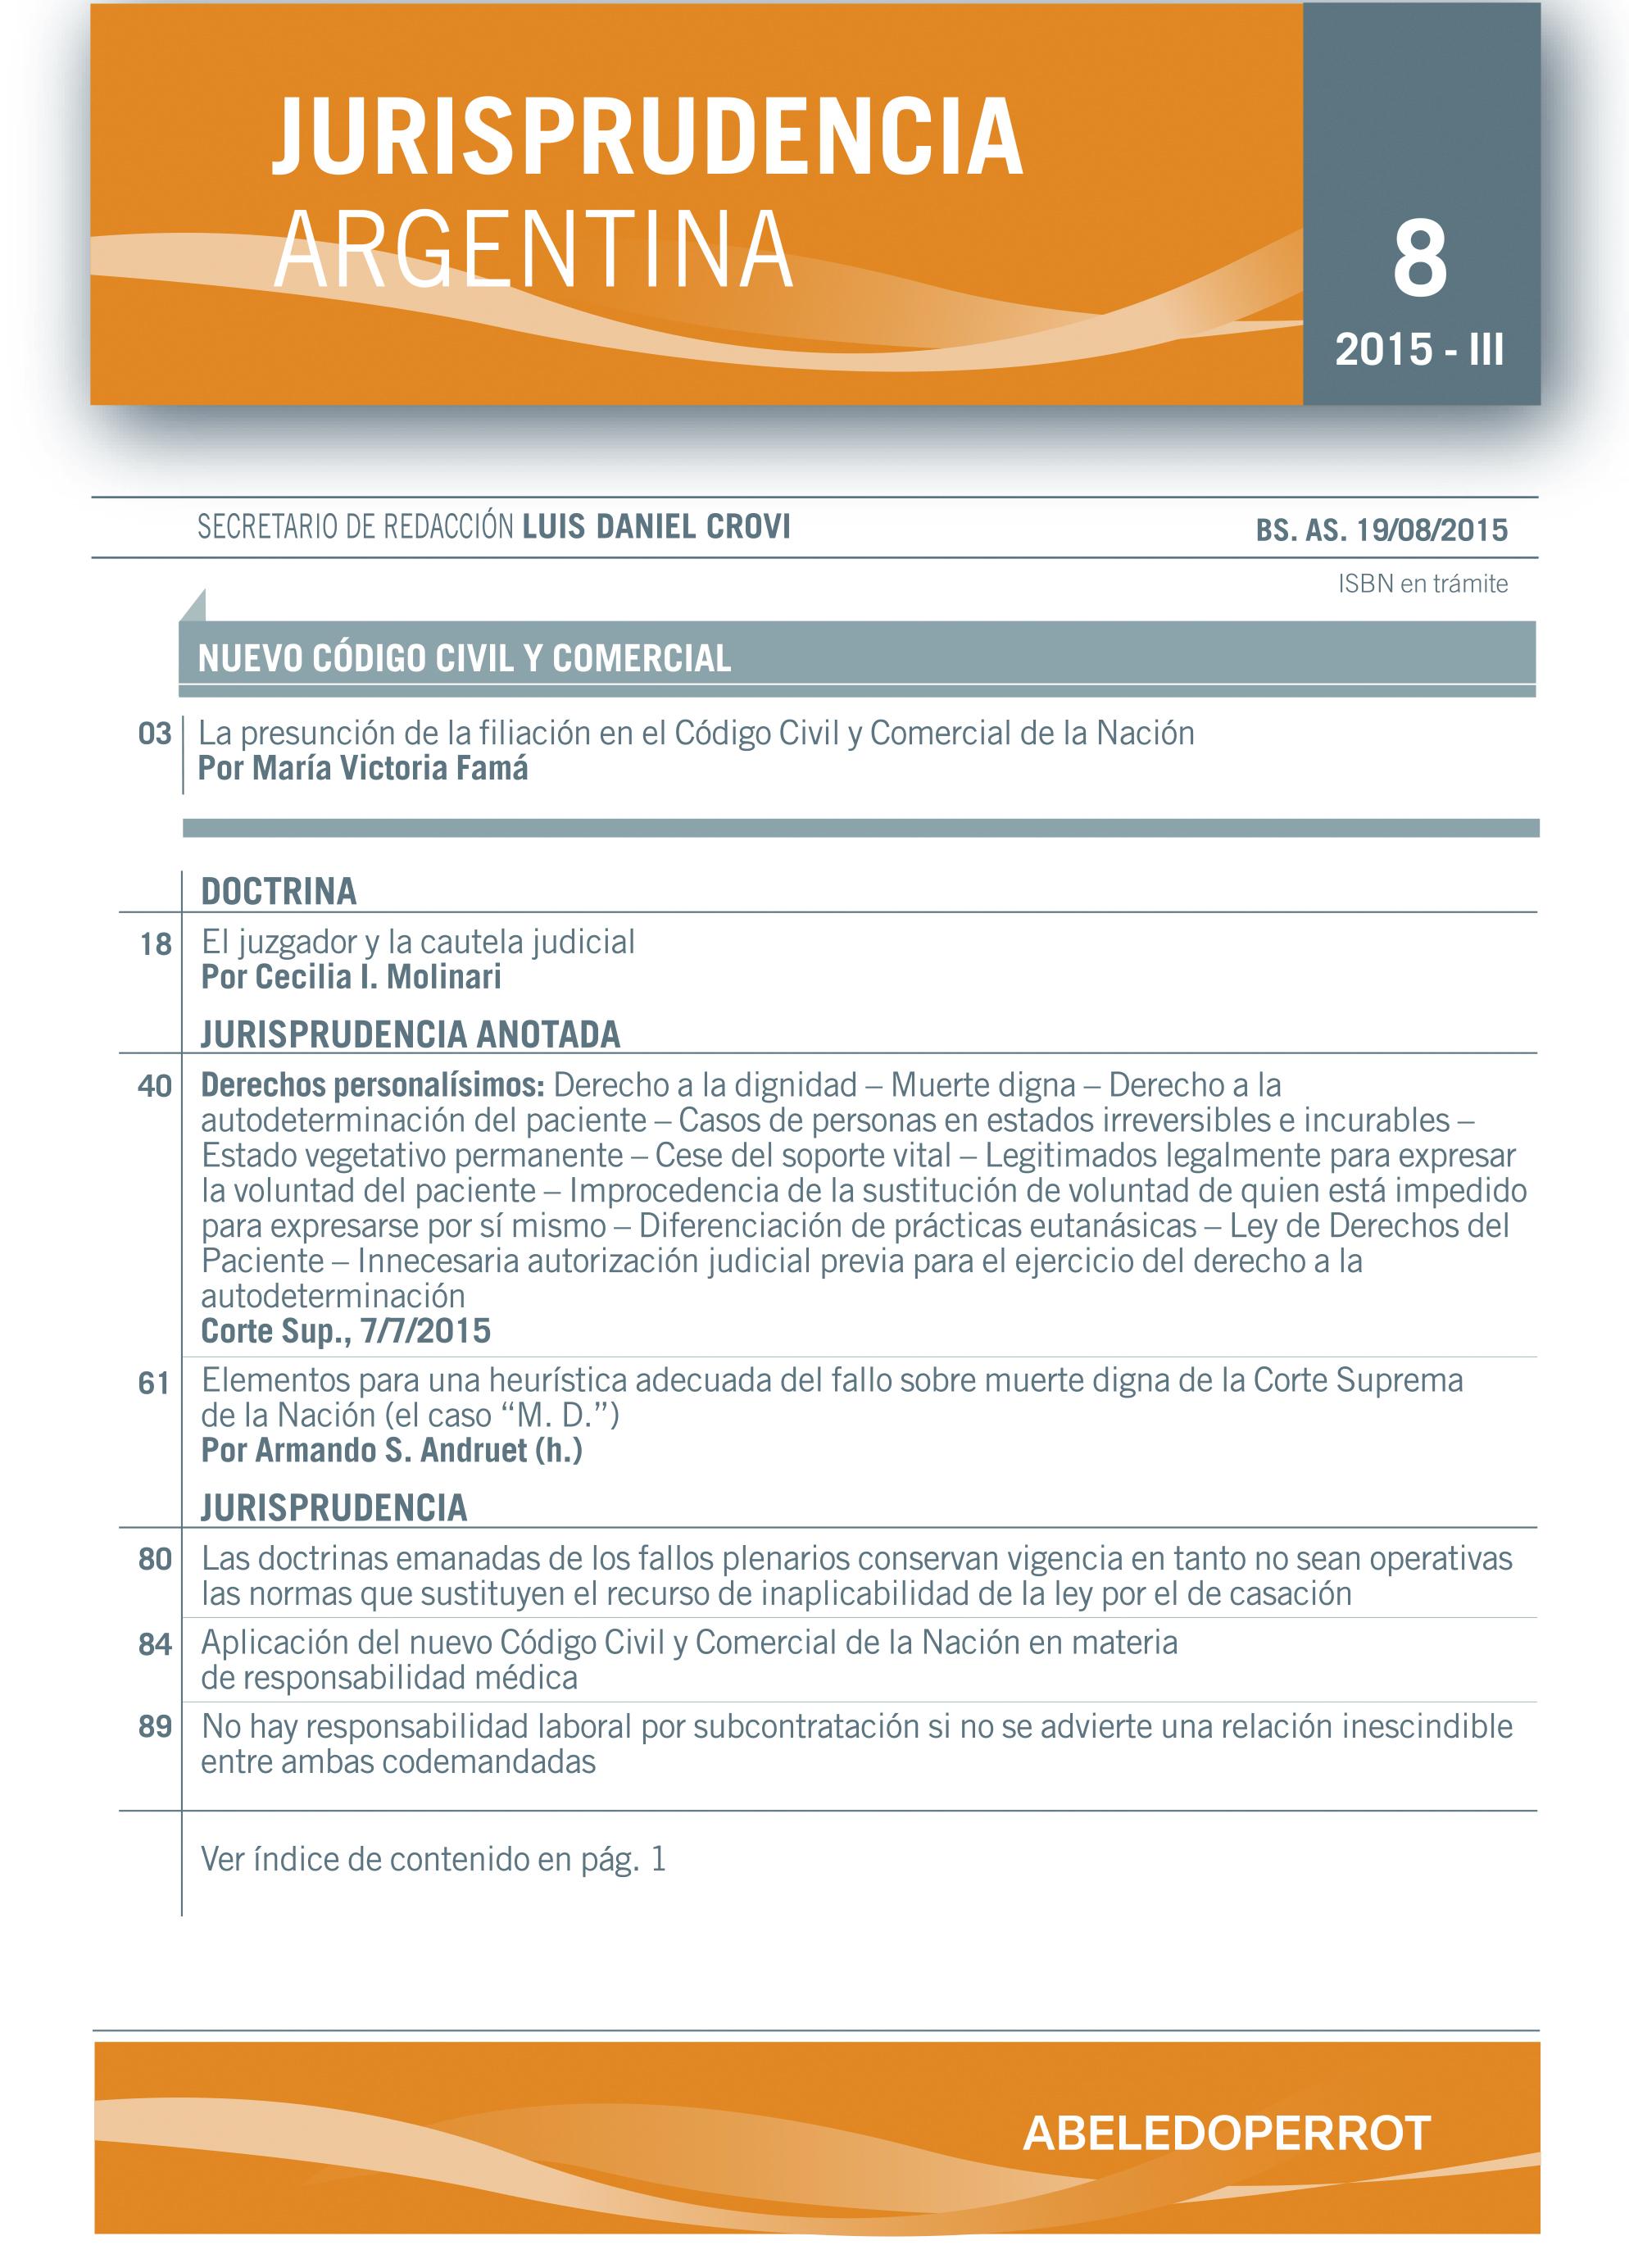 Tapa JA-2015 completa -III- fasc8 - Print para publicidad